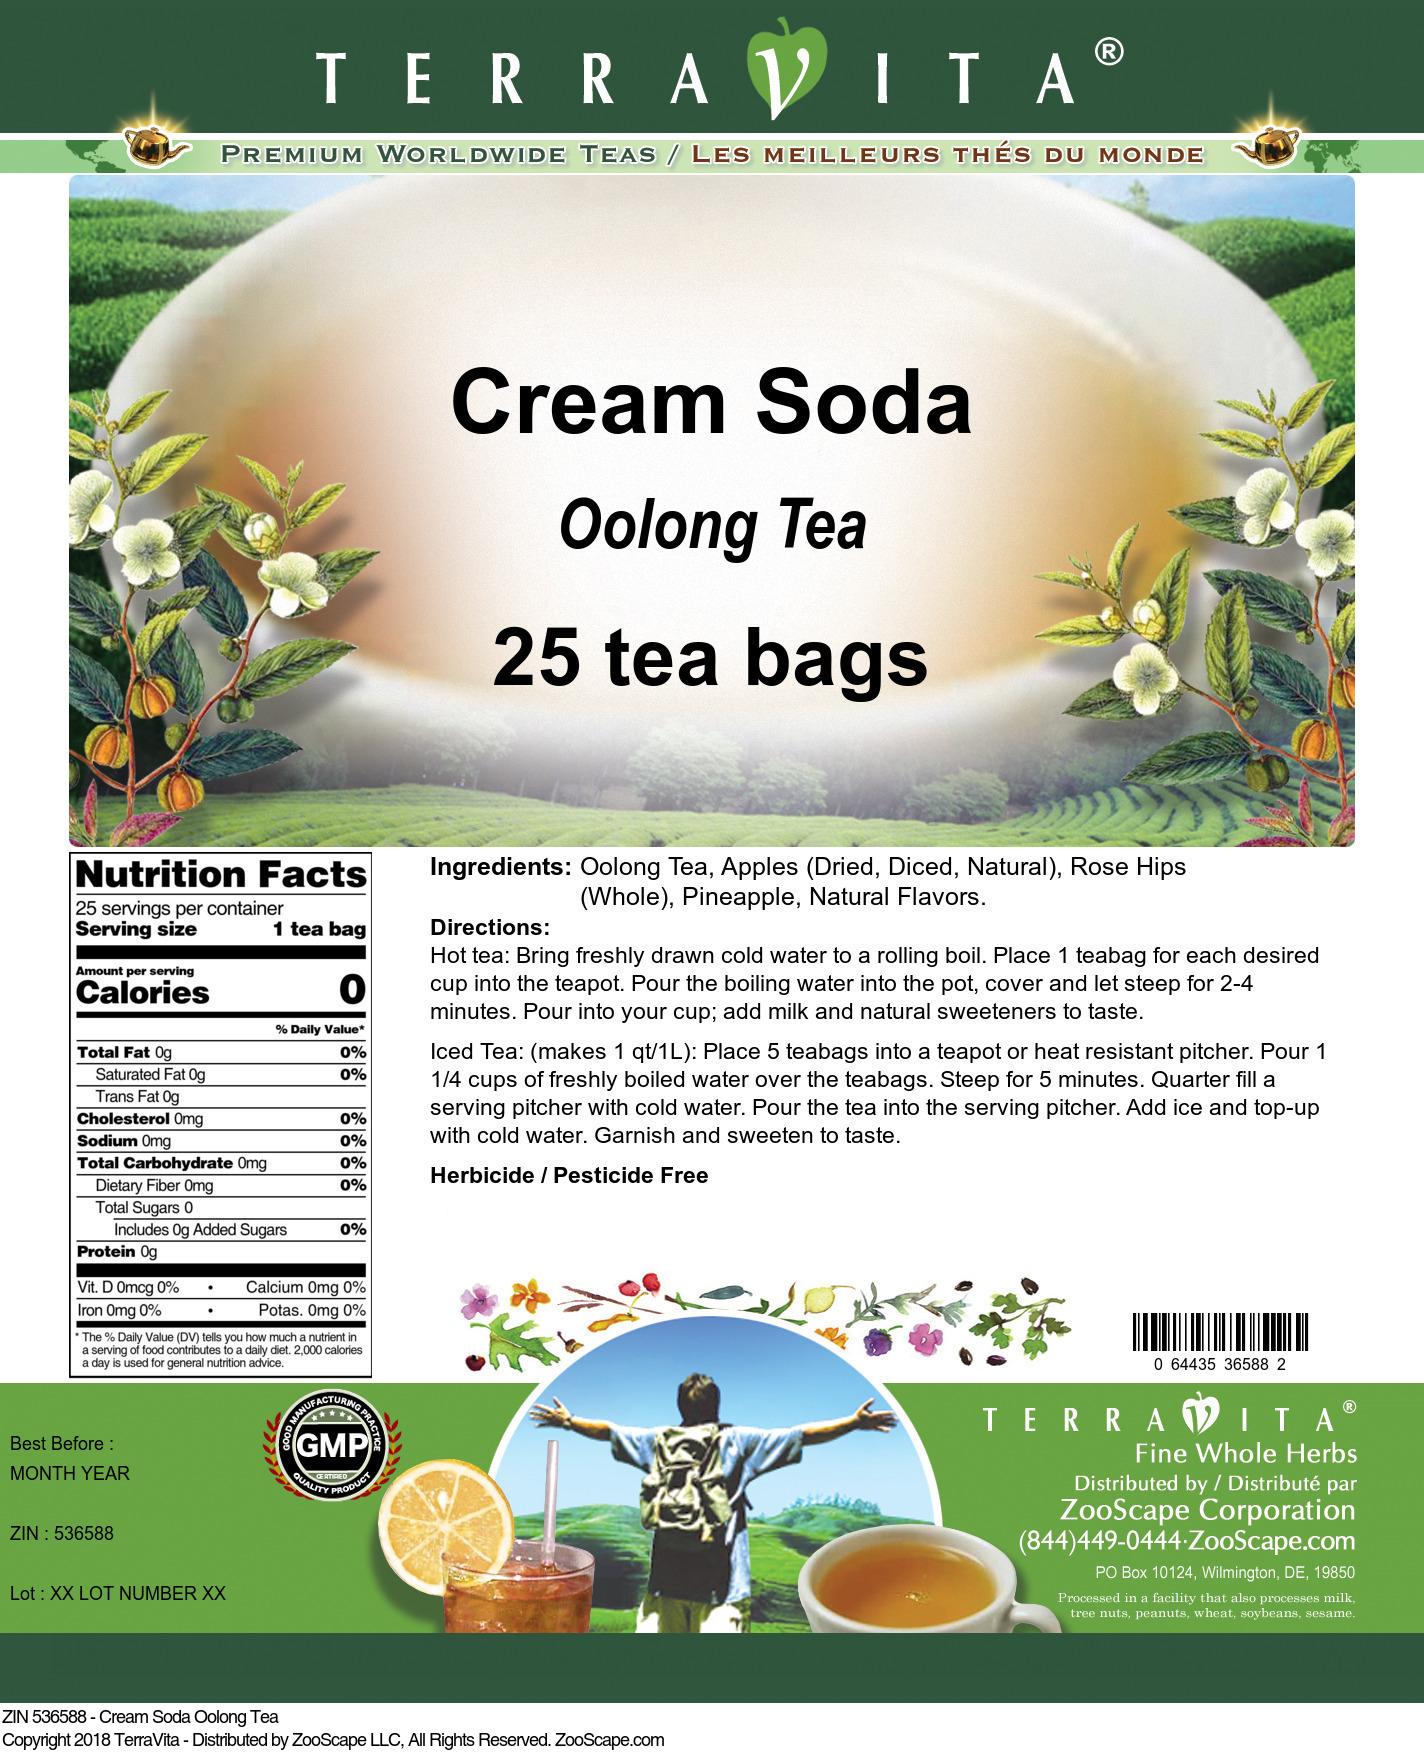 Cream Soda Oolong Tea